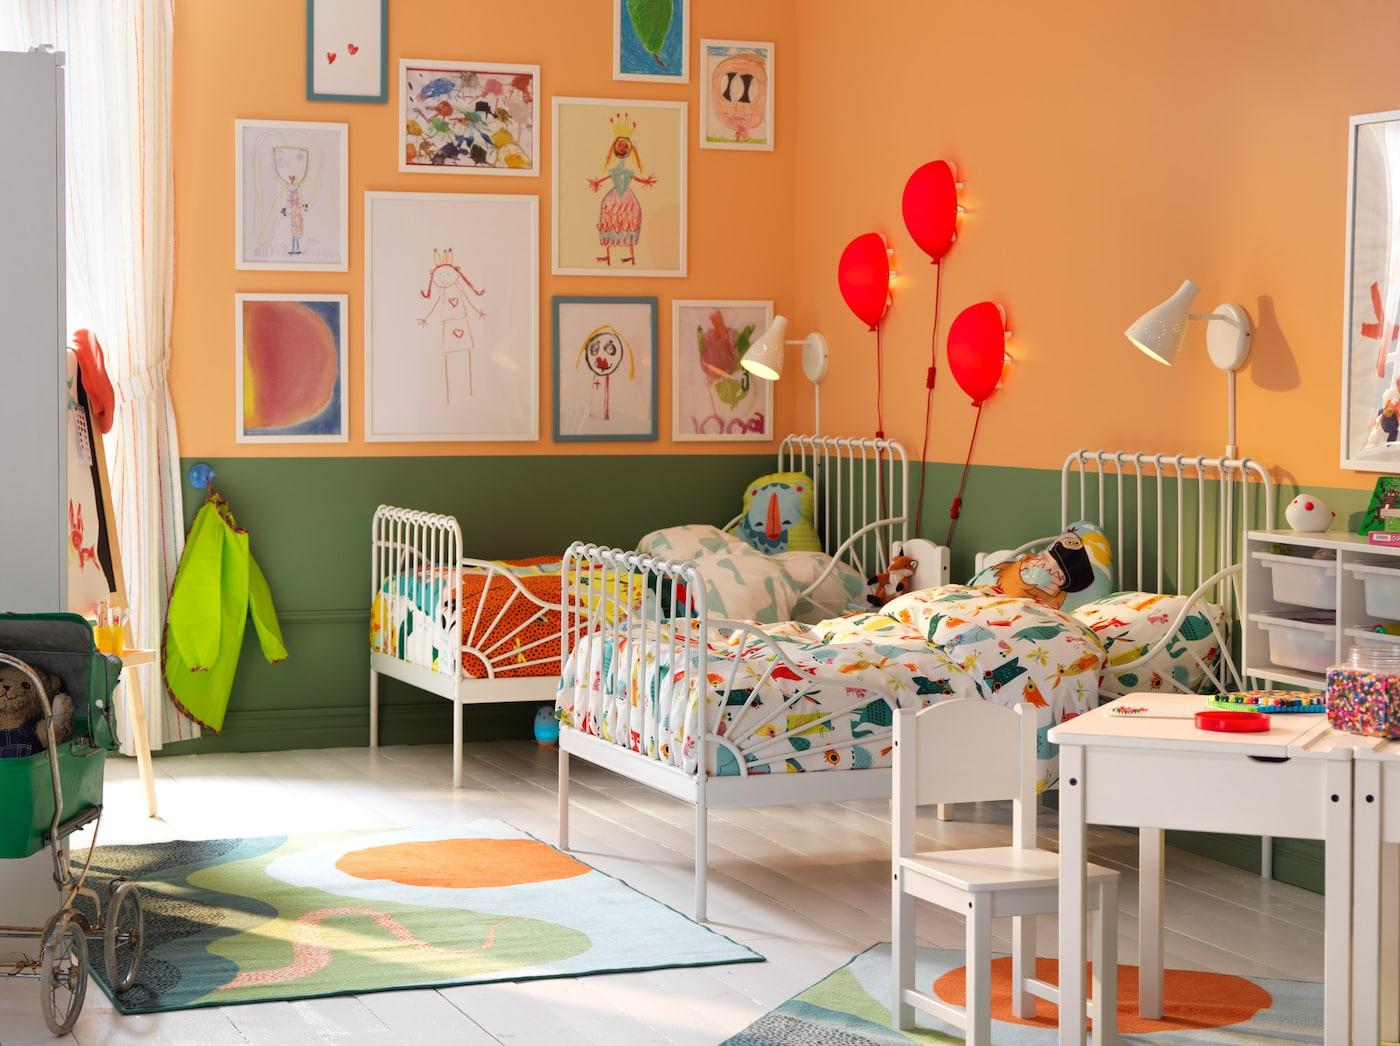 Ein kinderzimmer f r sonnige gem ter ikea ikea - Wandaufbewahrung kinderzimmer ...